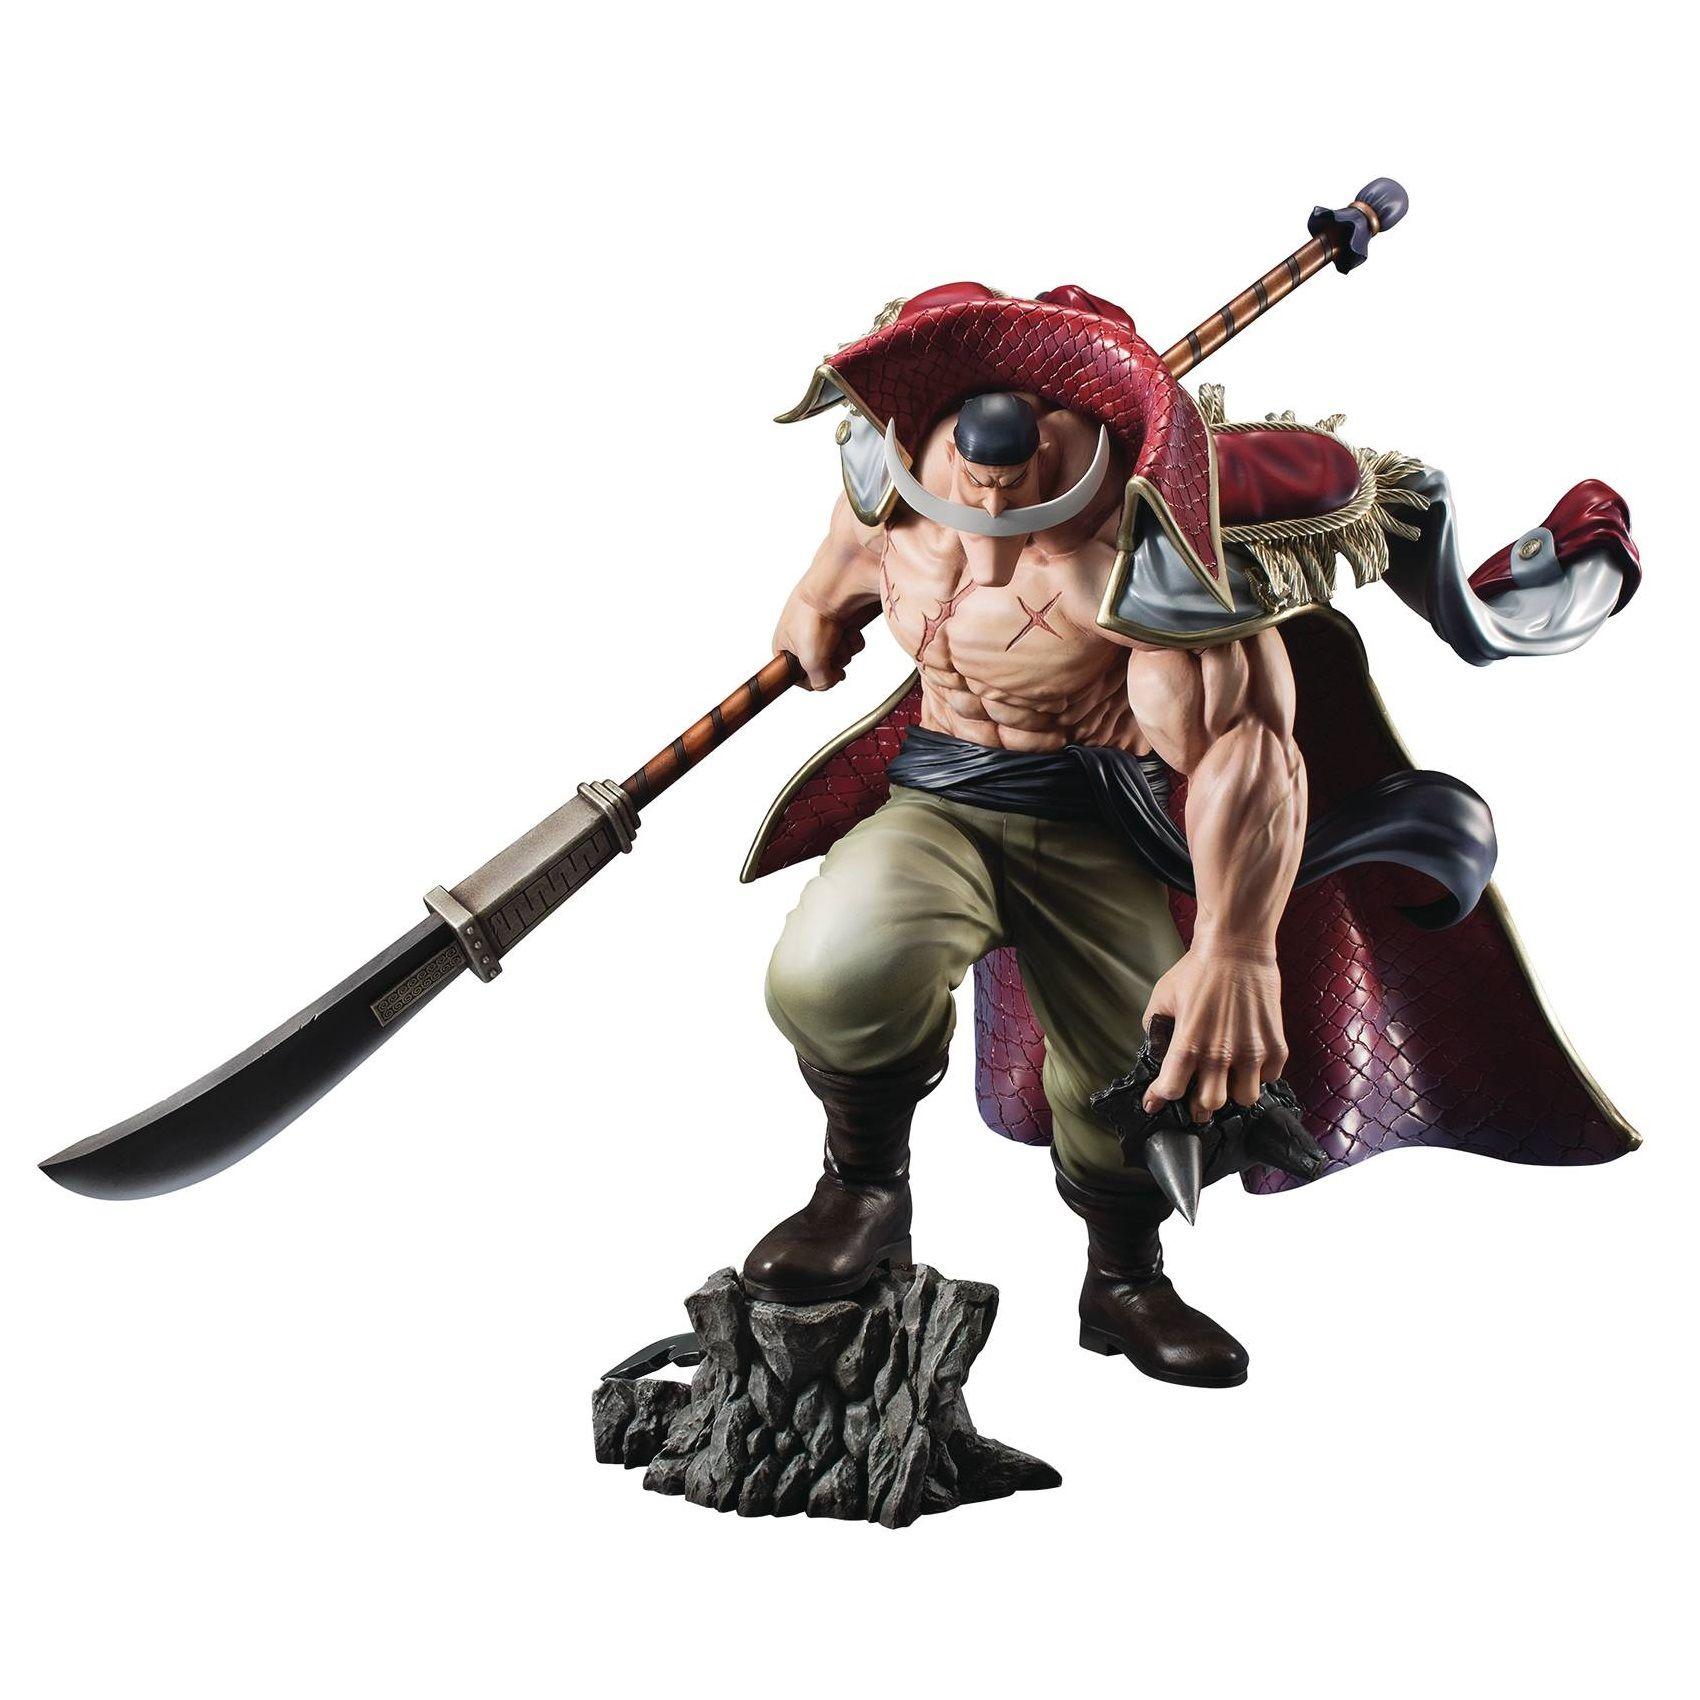 One Piece Portrait of Pirates NeoMaximum Whitebeard